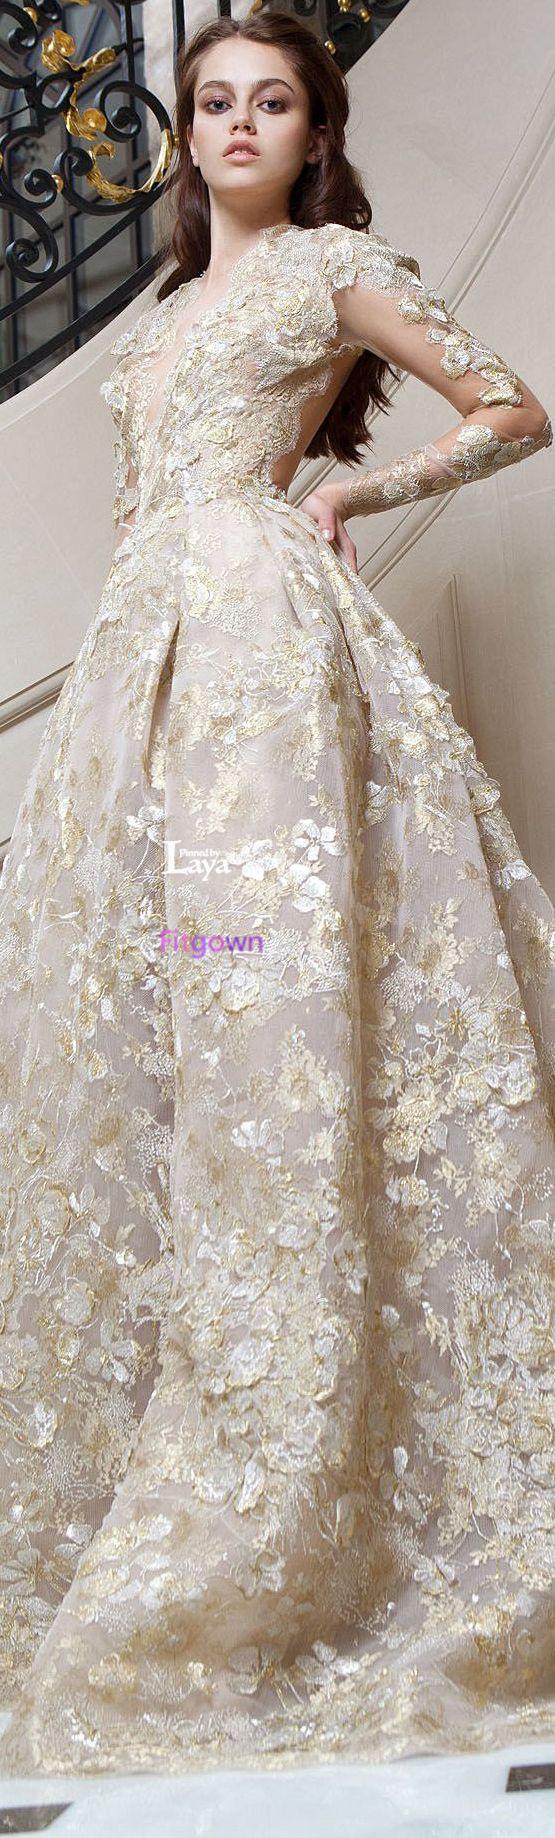 Gorgeous lace wedding dress street style pinterest lace